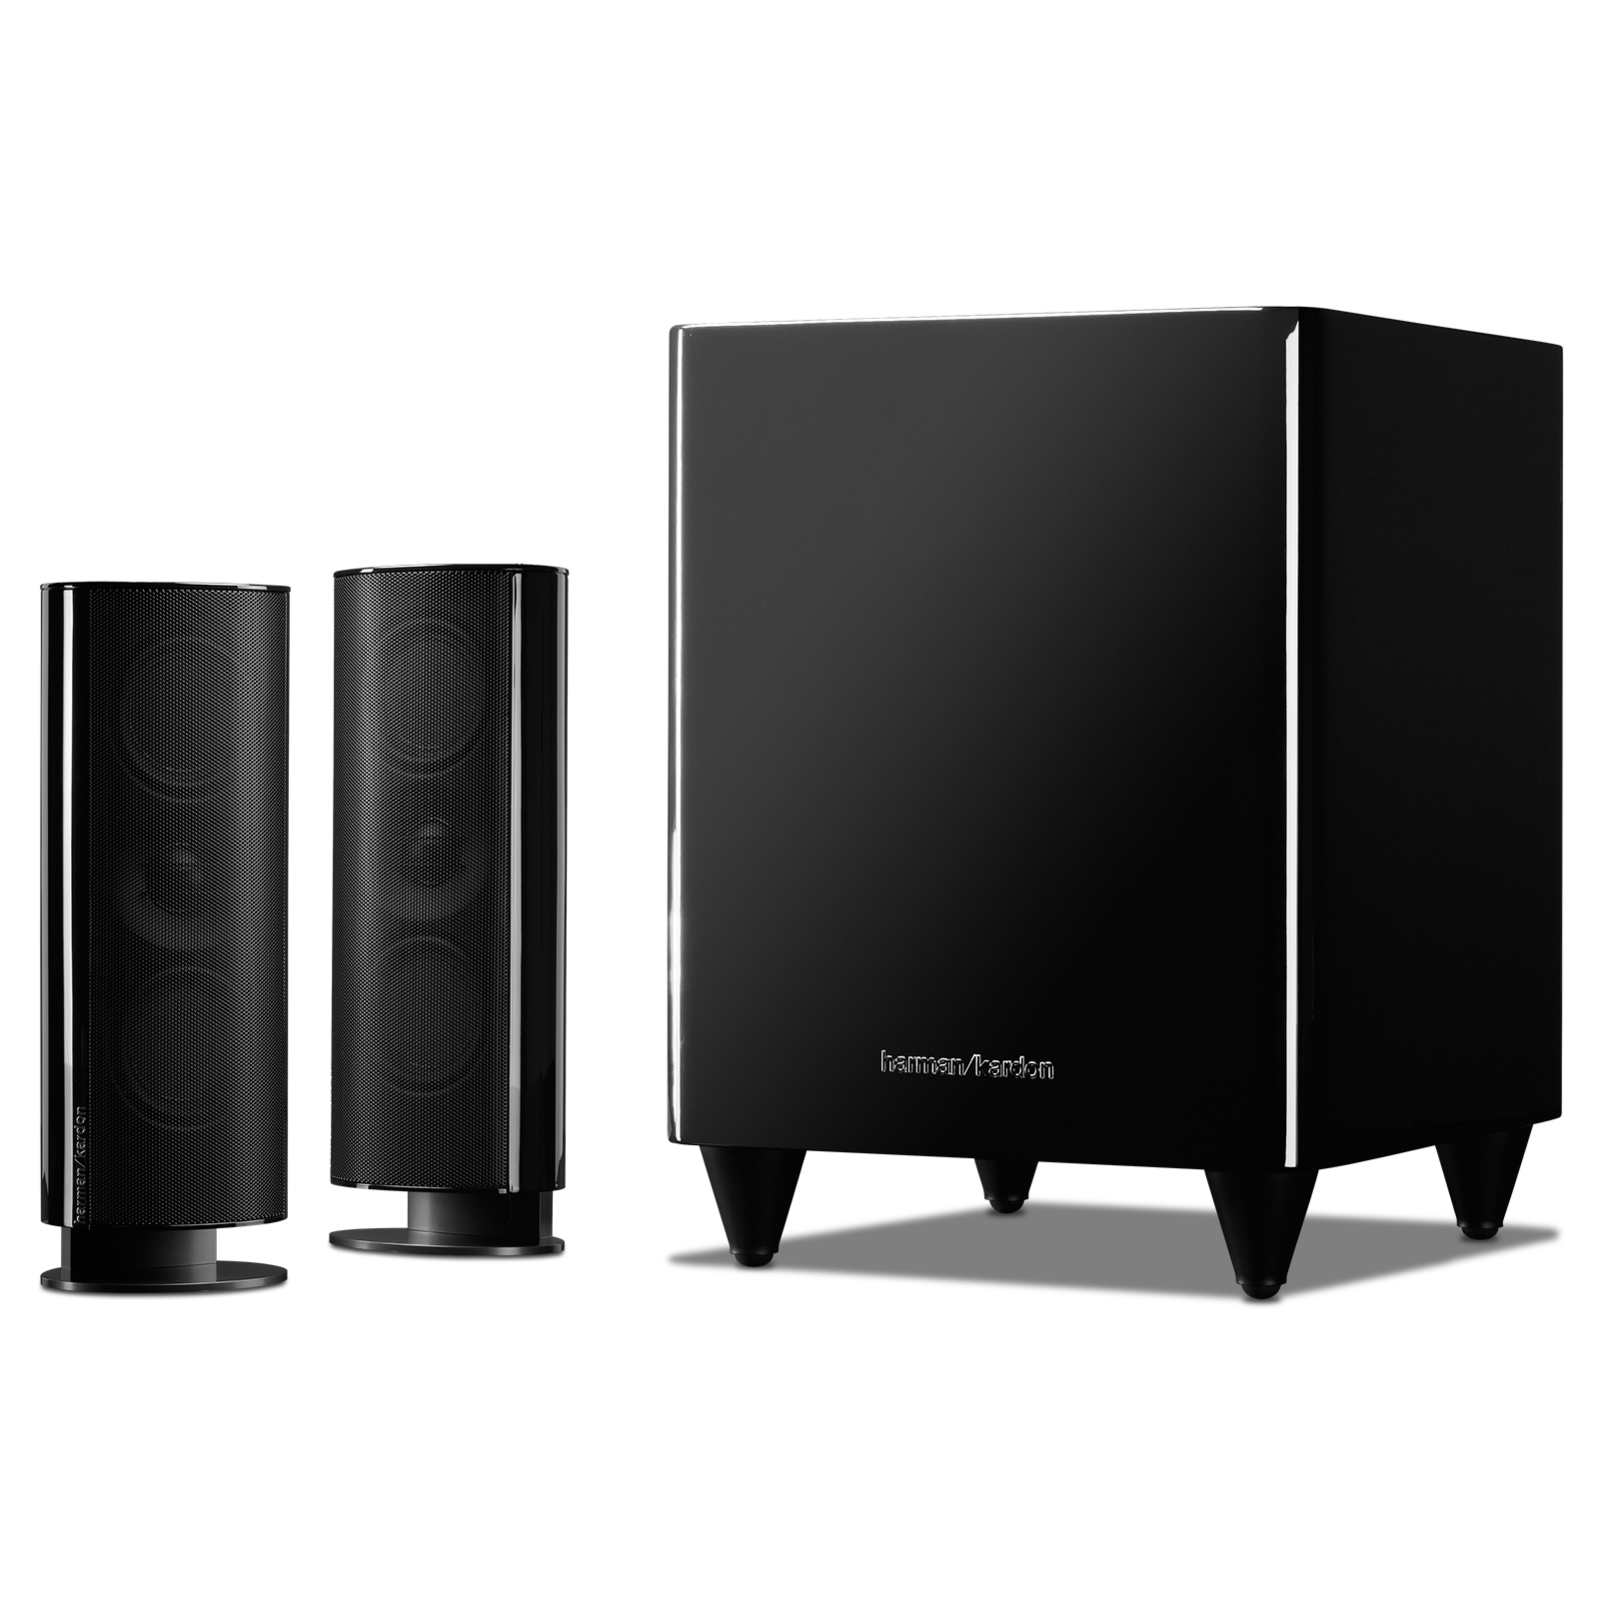 HKTS 200 - Black - A 2.1-channel home theater speaker system with powered subwoofer - Detailshot 1